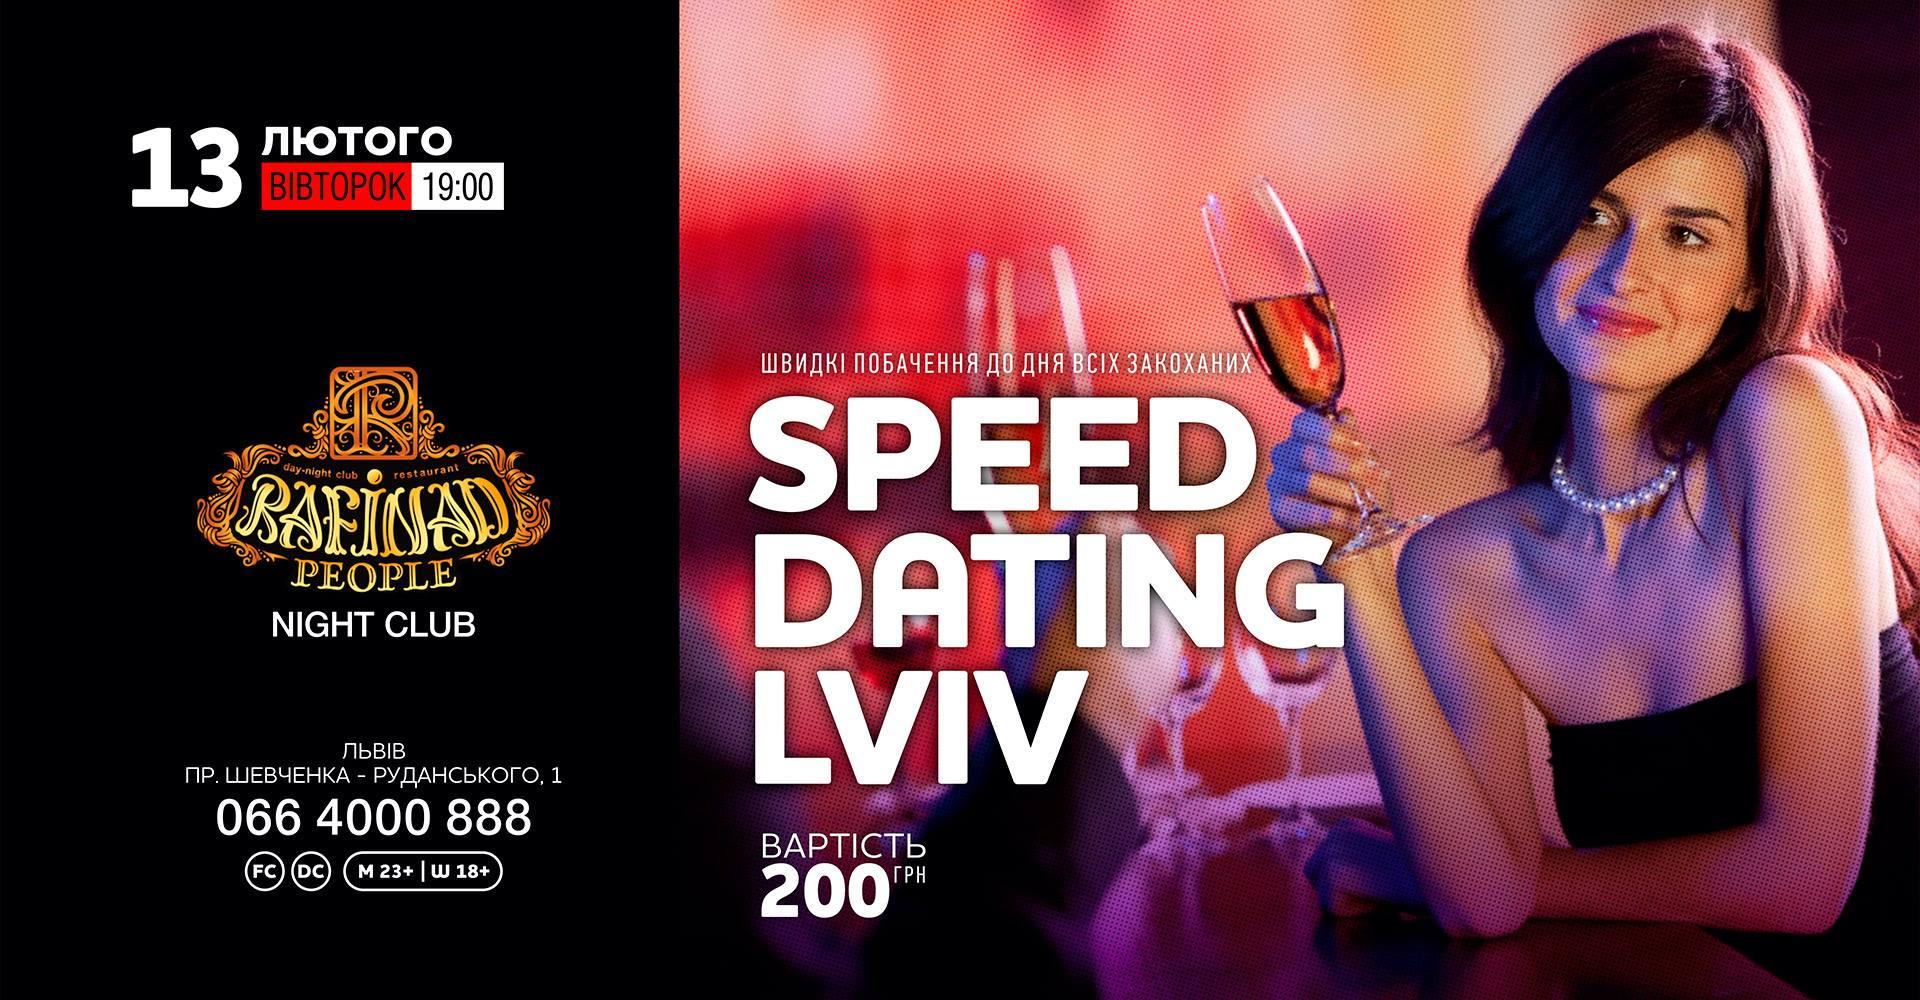 Speed dating lviv